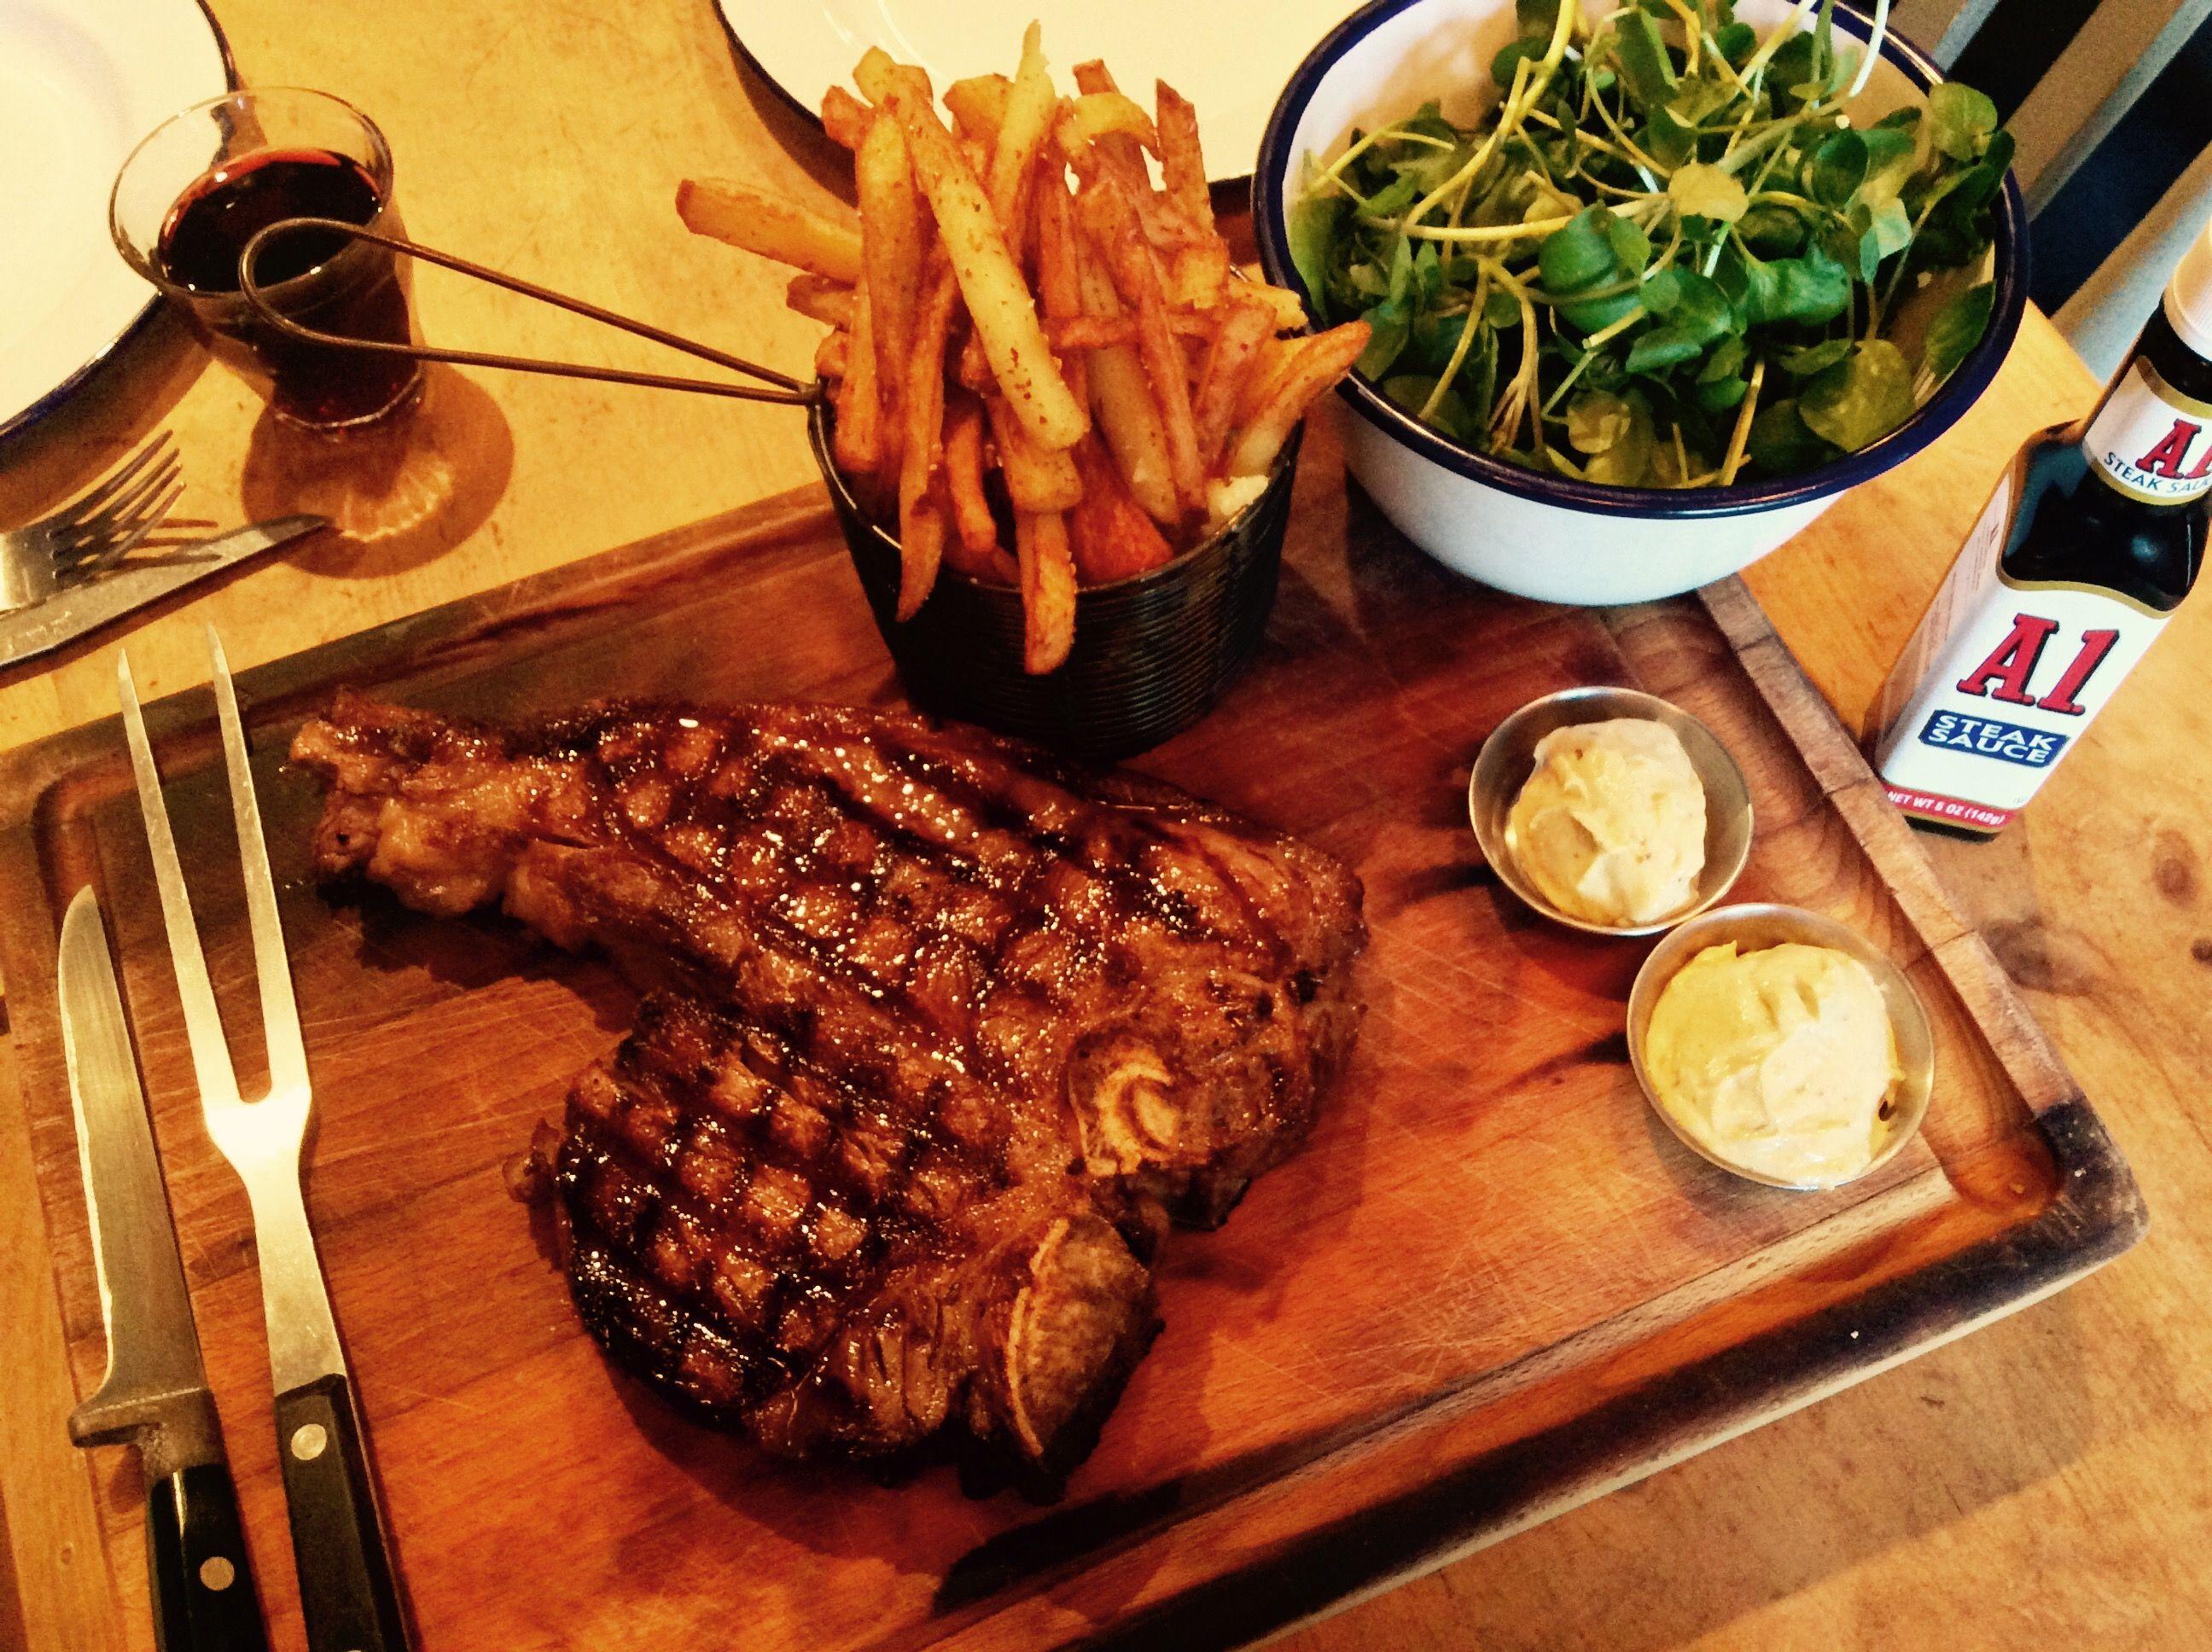 Sharing T-Bone of dry aged steak. Served with watercress salad, seasoned fries, horseradish and mustard.